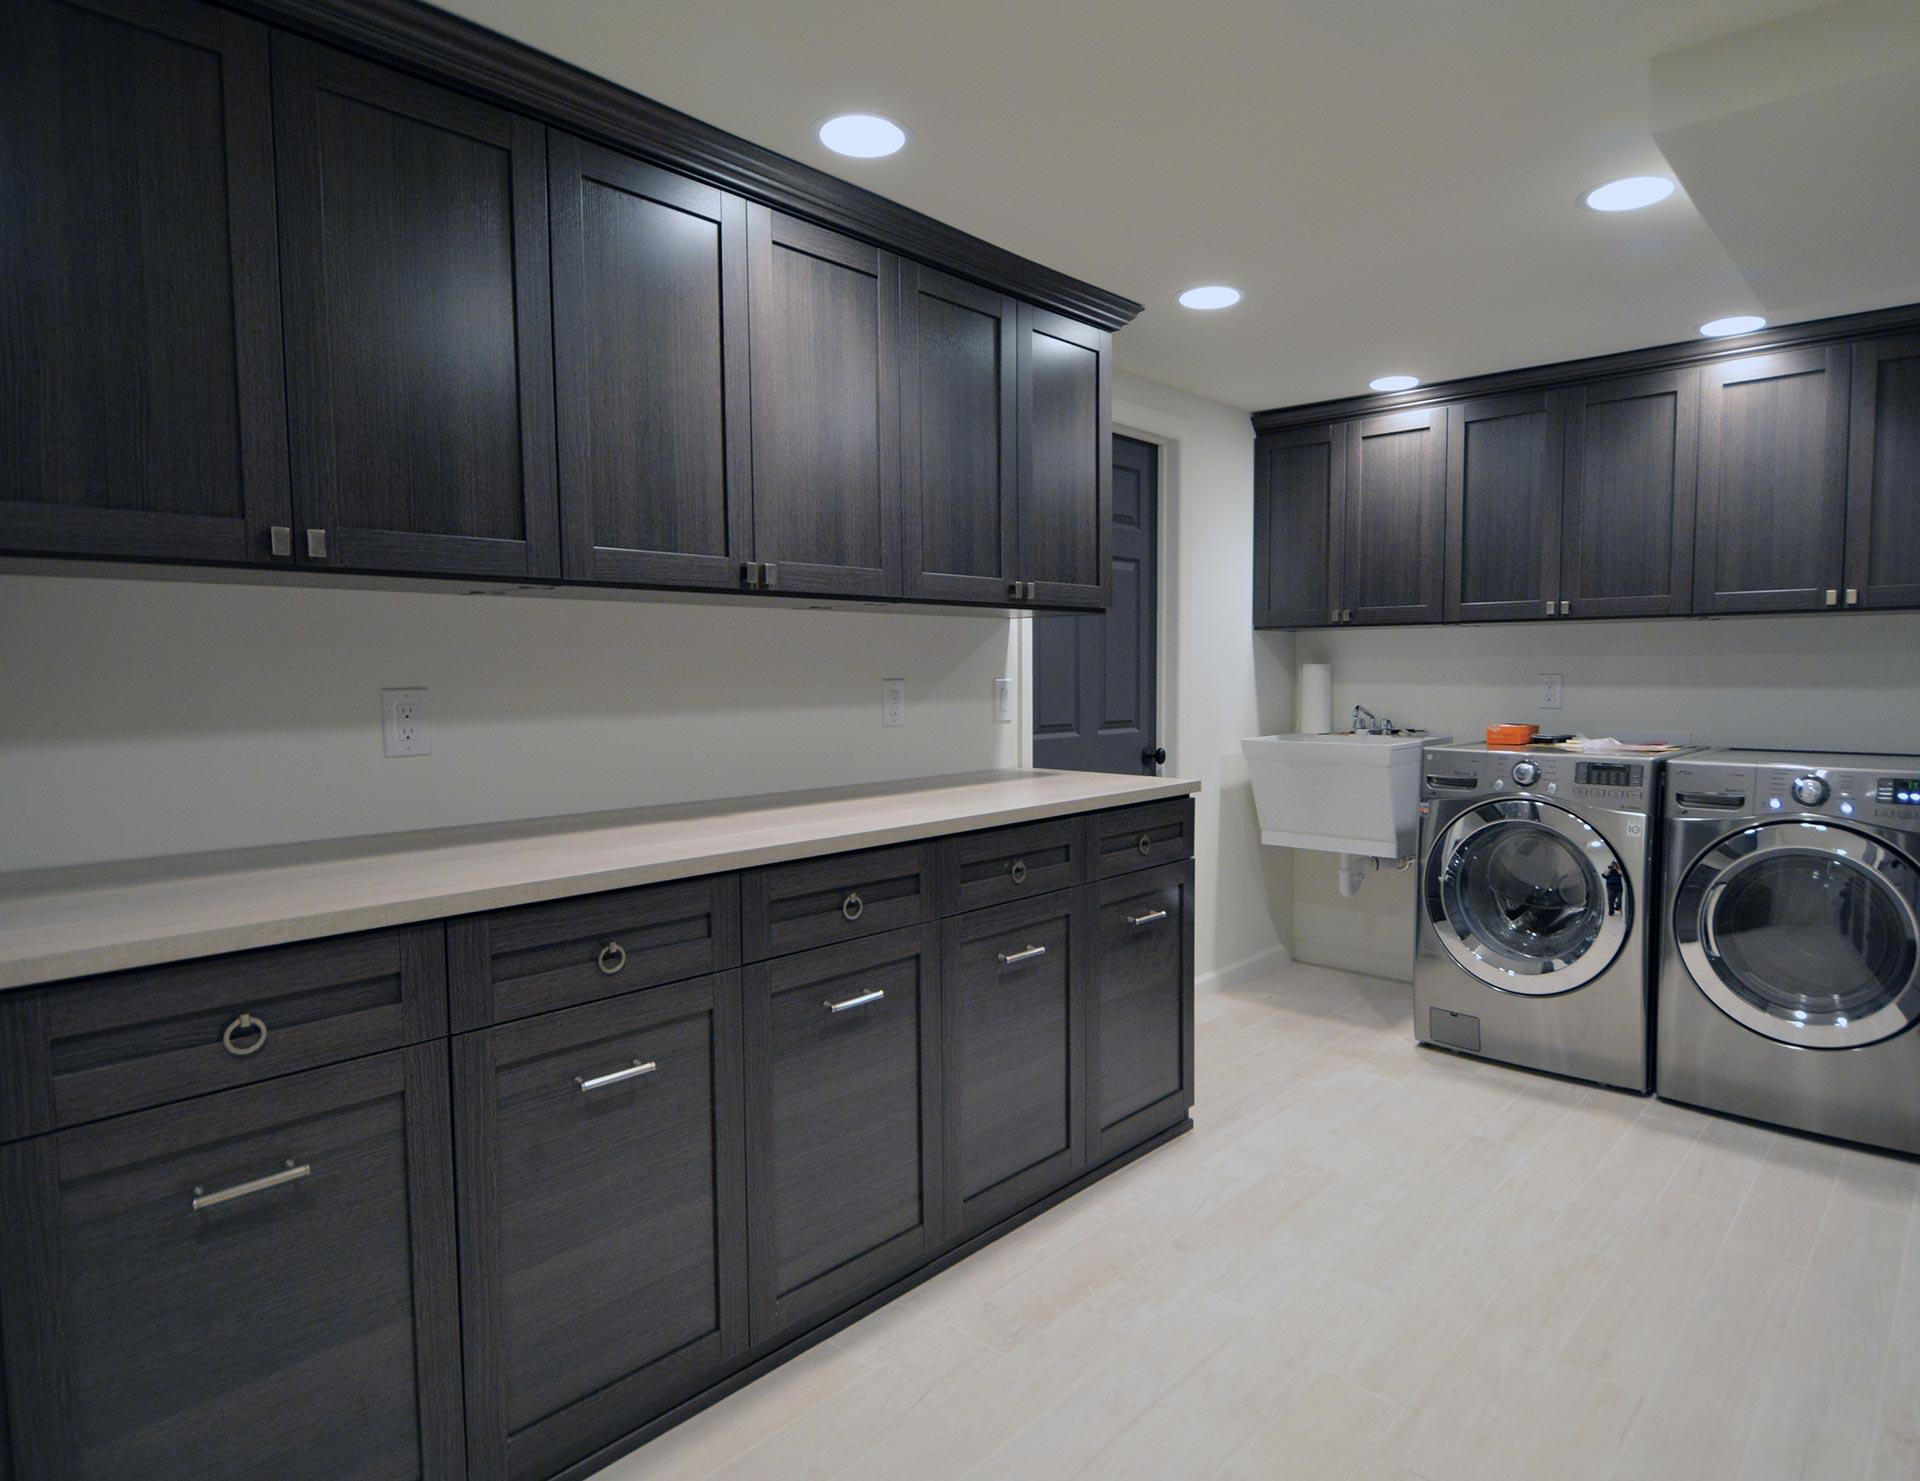 Laundry Room Cabinets & Storage Ideas | California Closets on Laundry Room Cabinets Ideas  id=15000